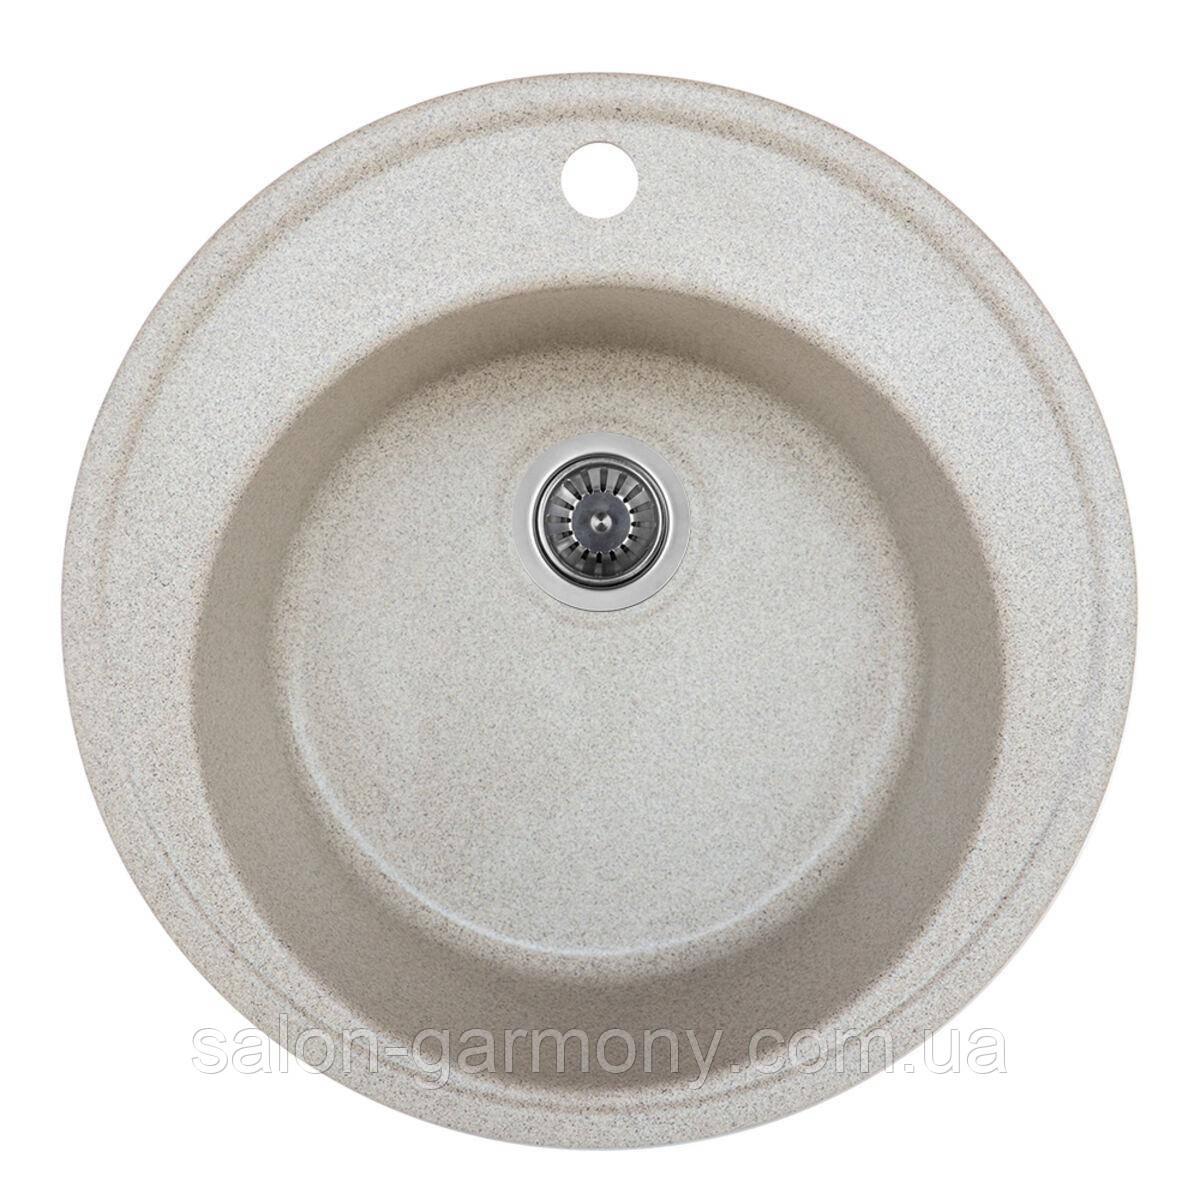 Гранітна мийка для кухні Platinum 510 YARA Сірий металік глянець